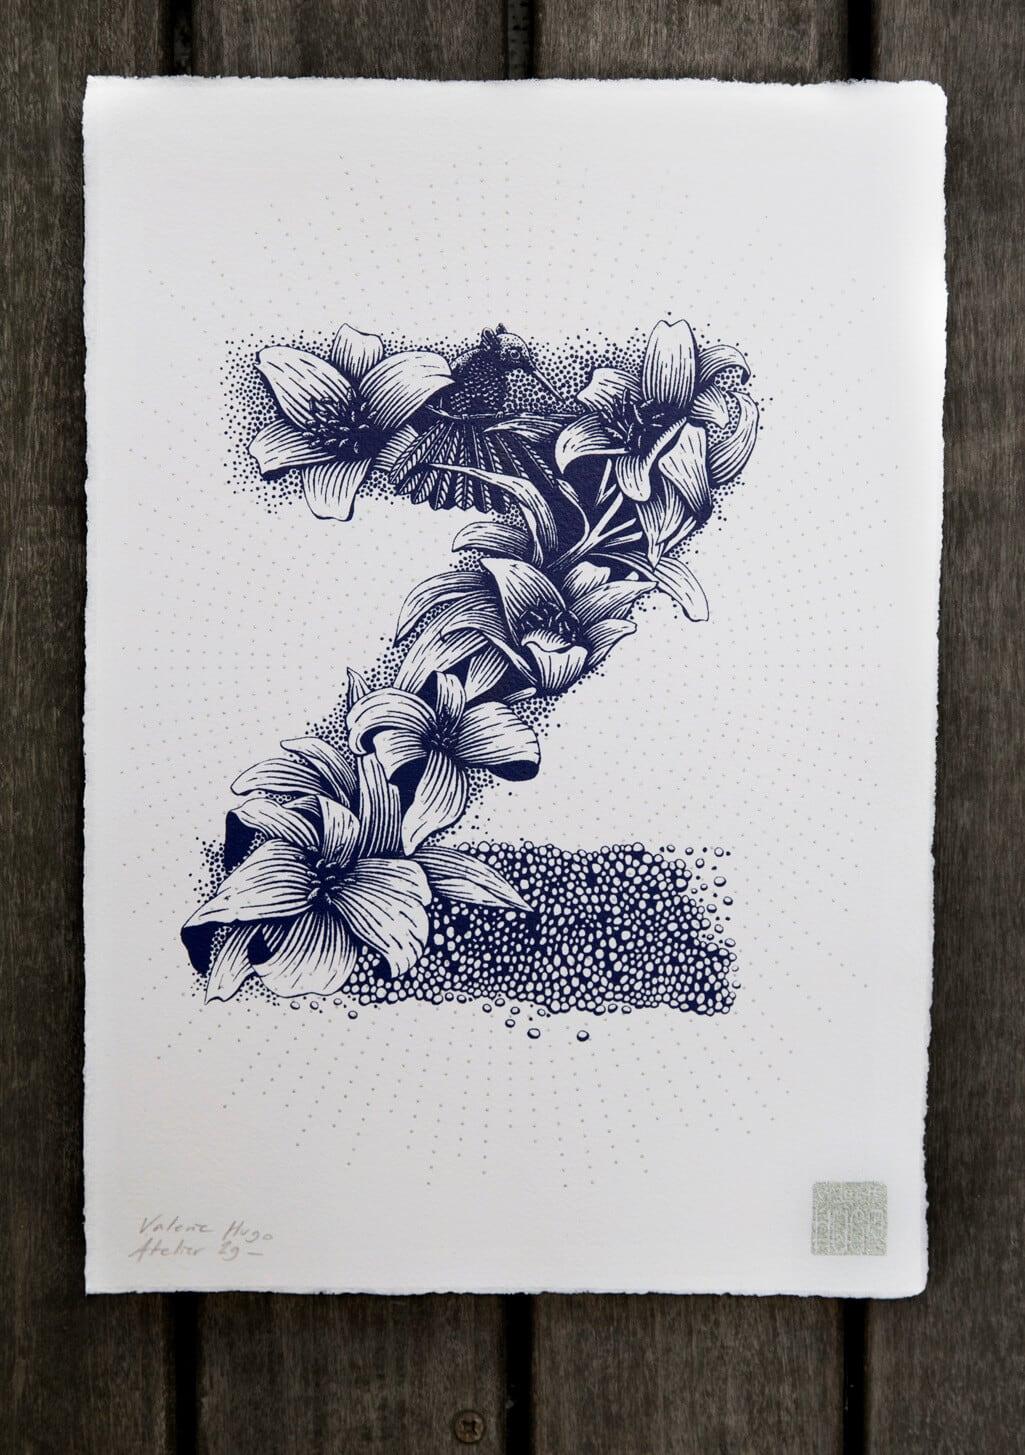 typography-valerie-hugo-fy-13